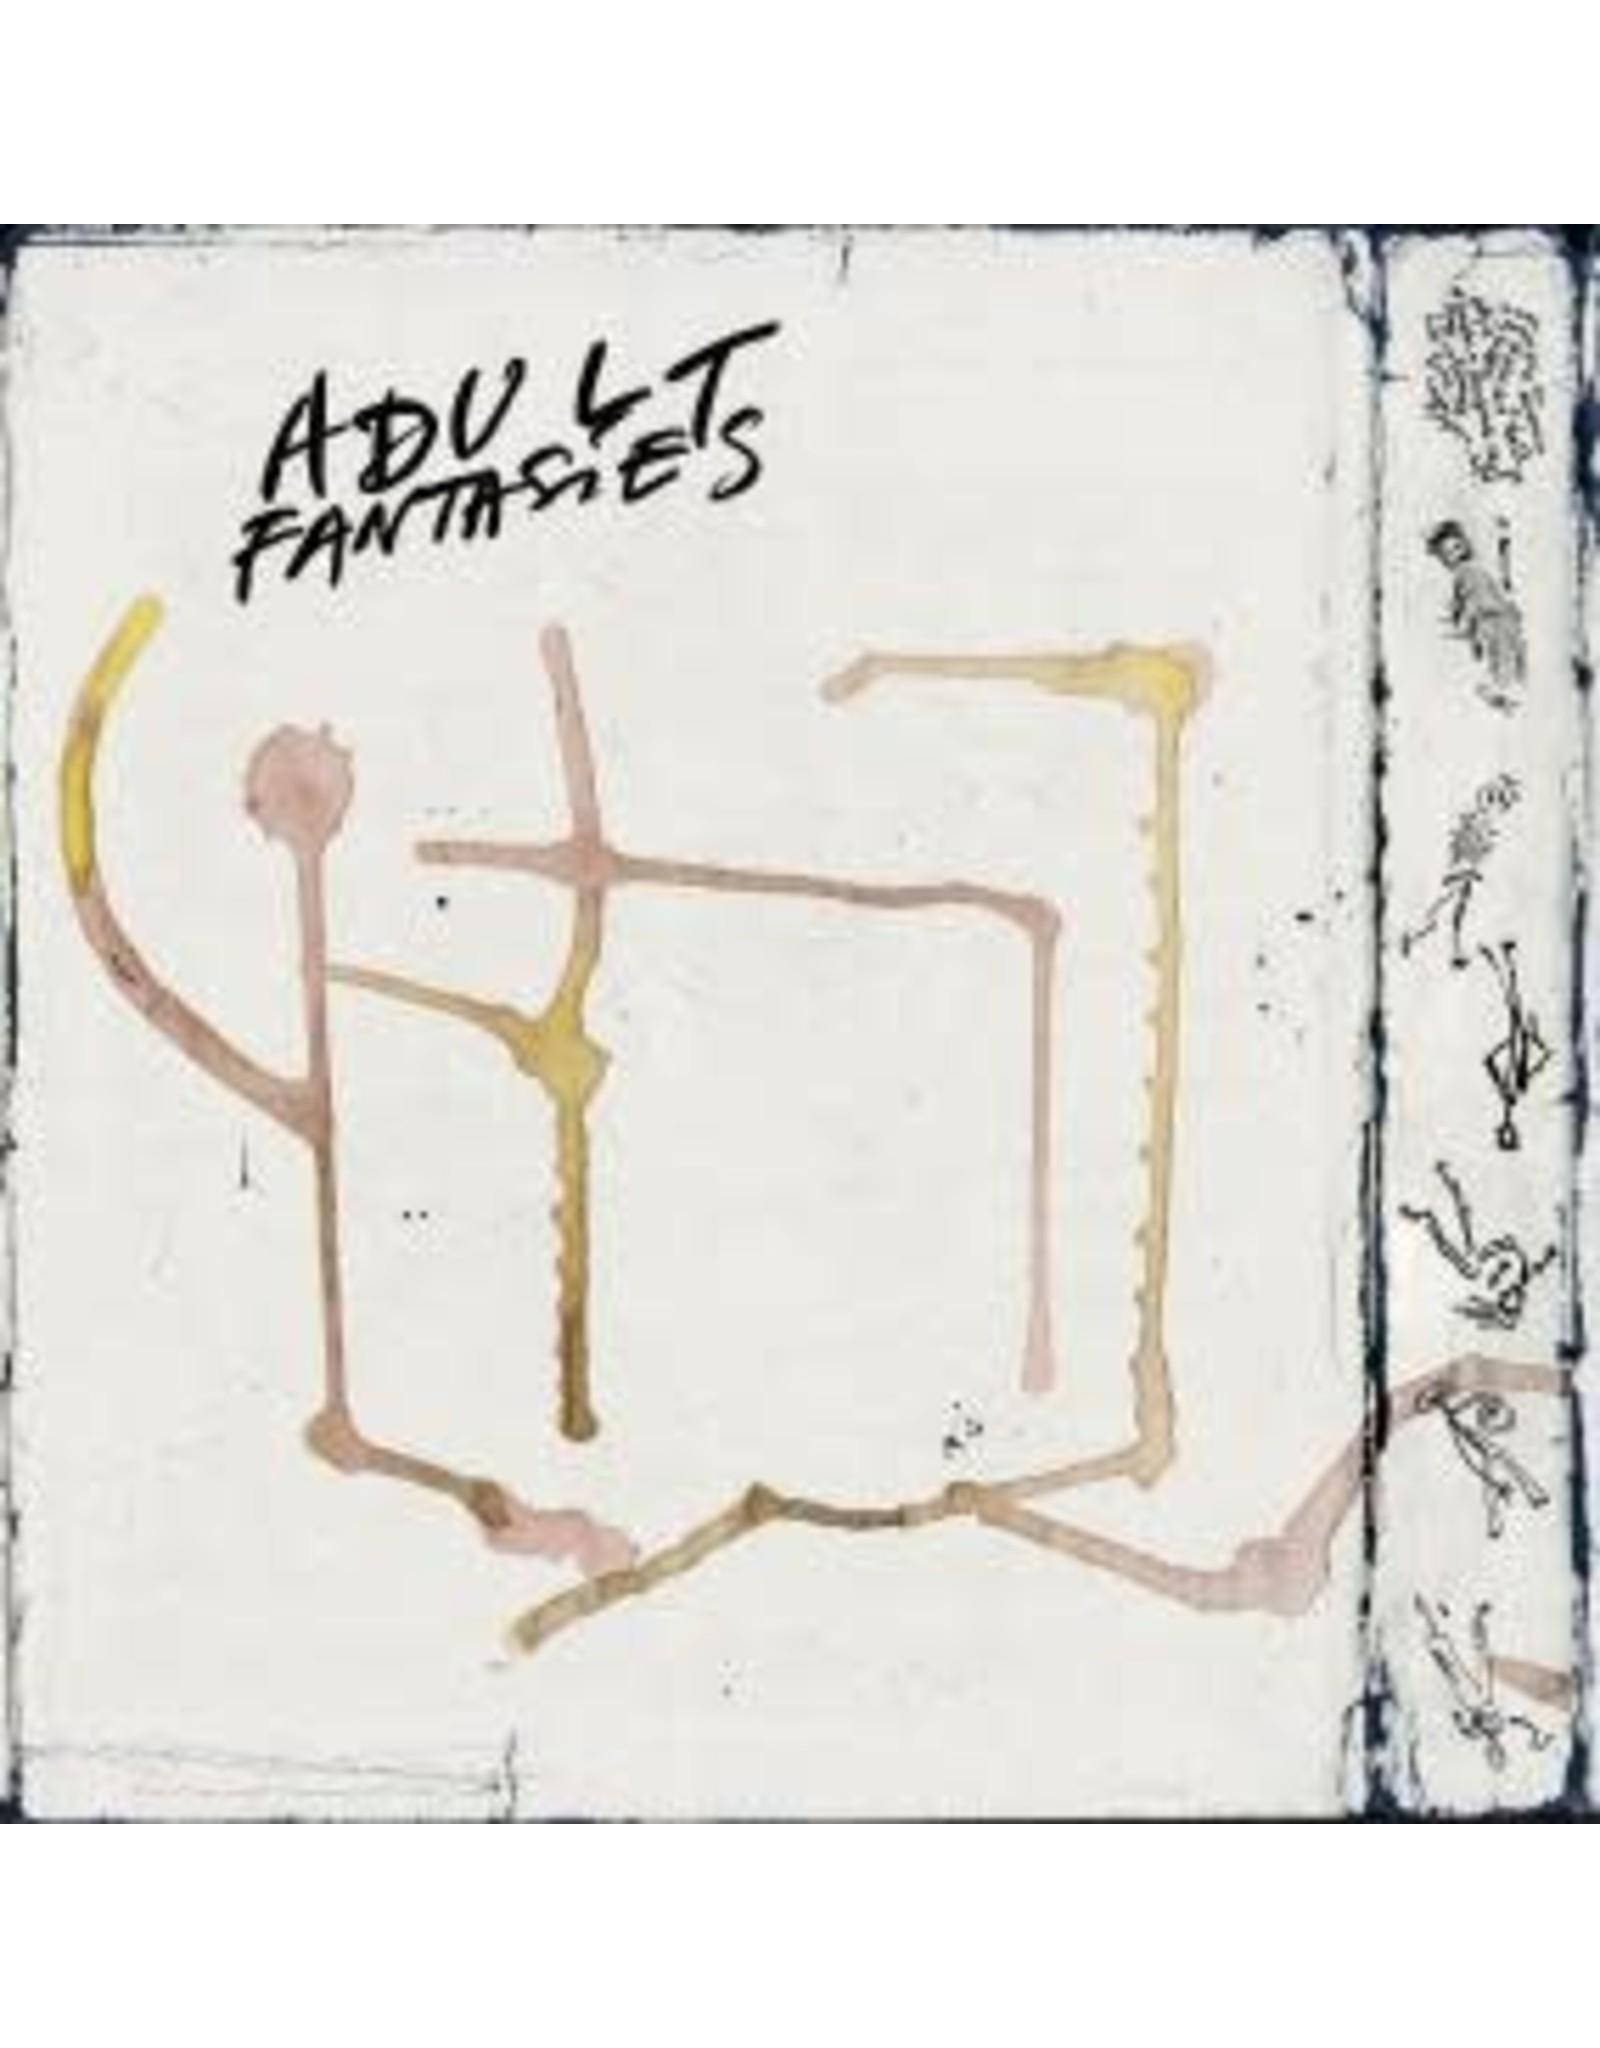 Stroom Adult Fantasies: Towers of Silence LP